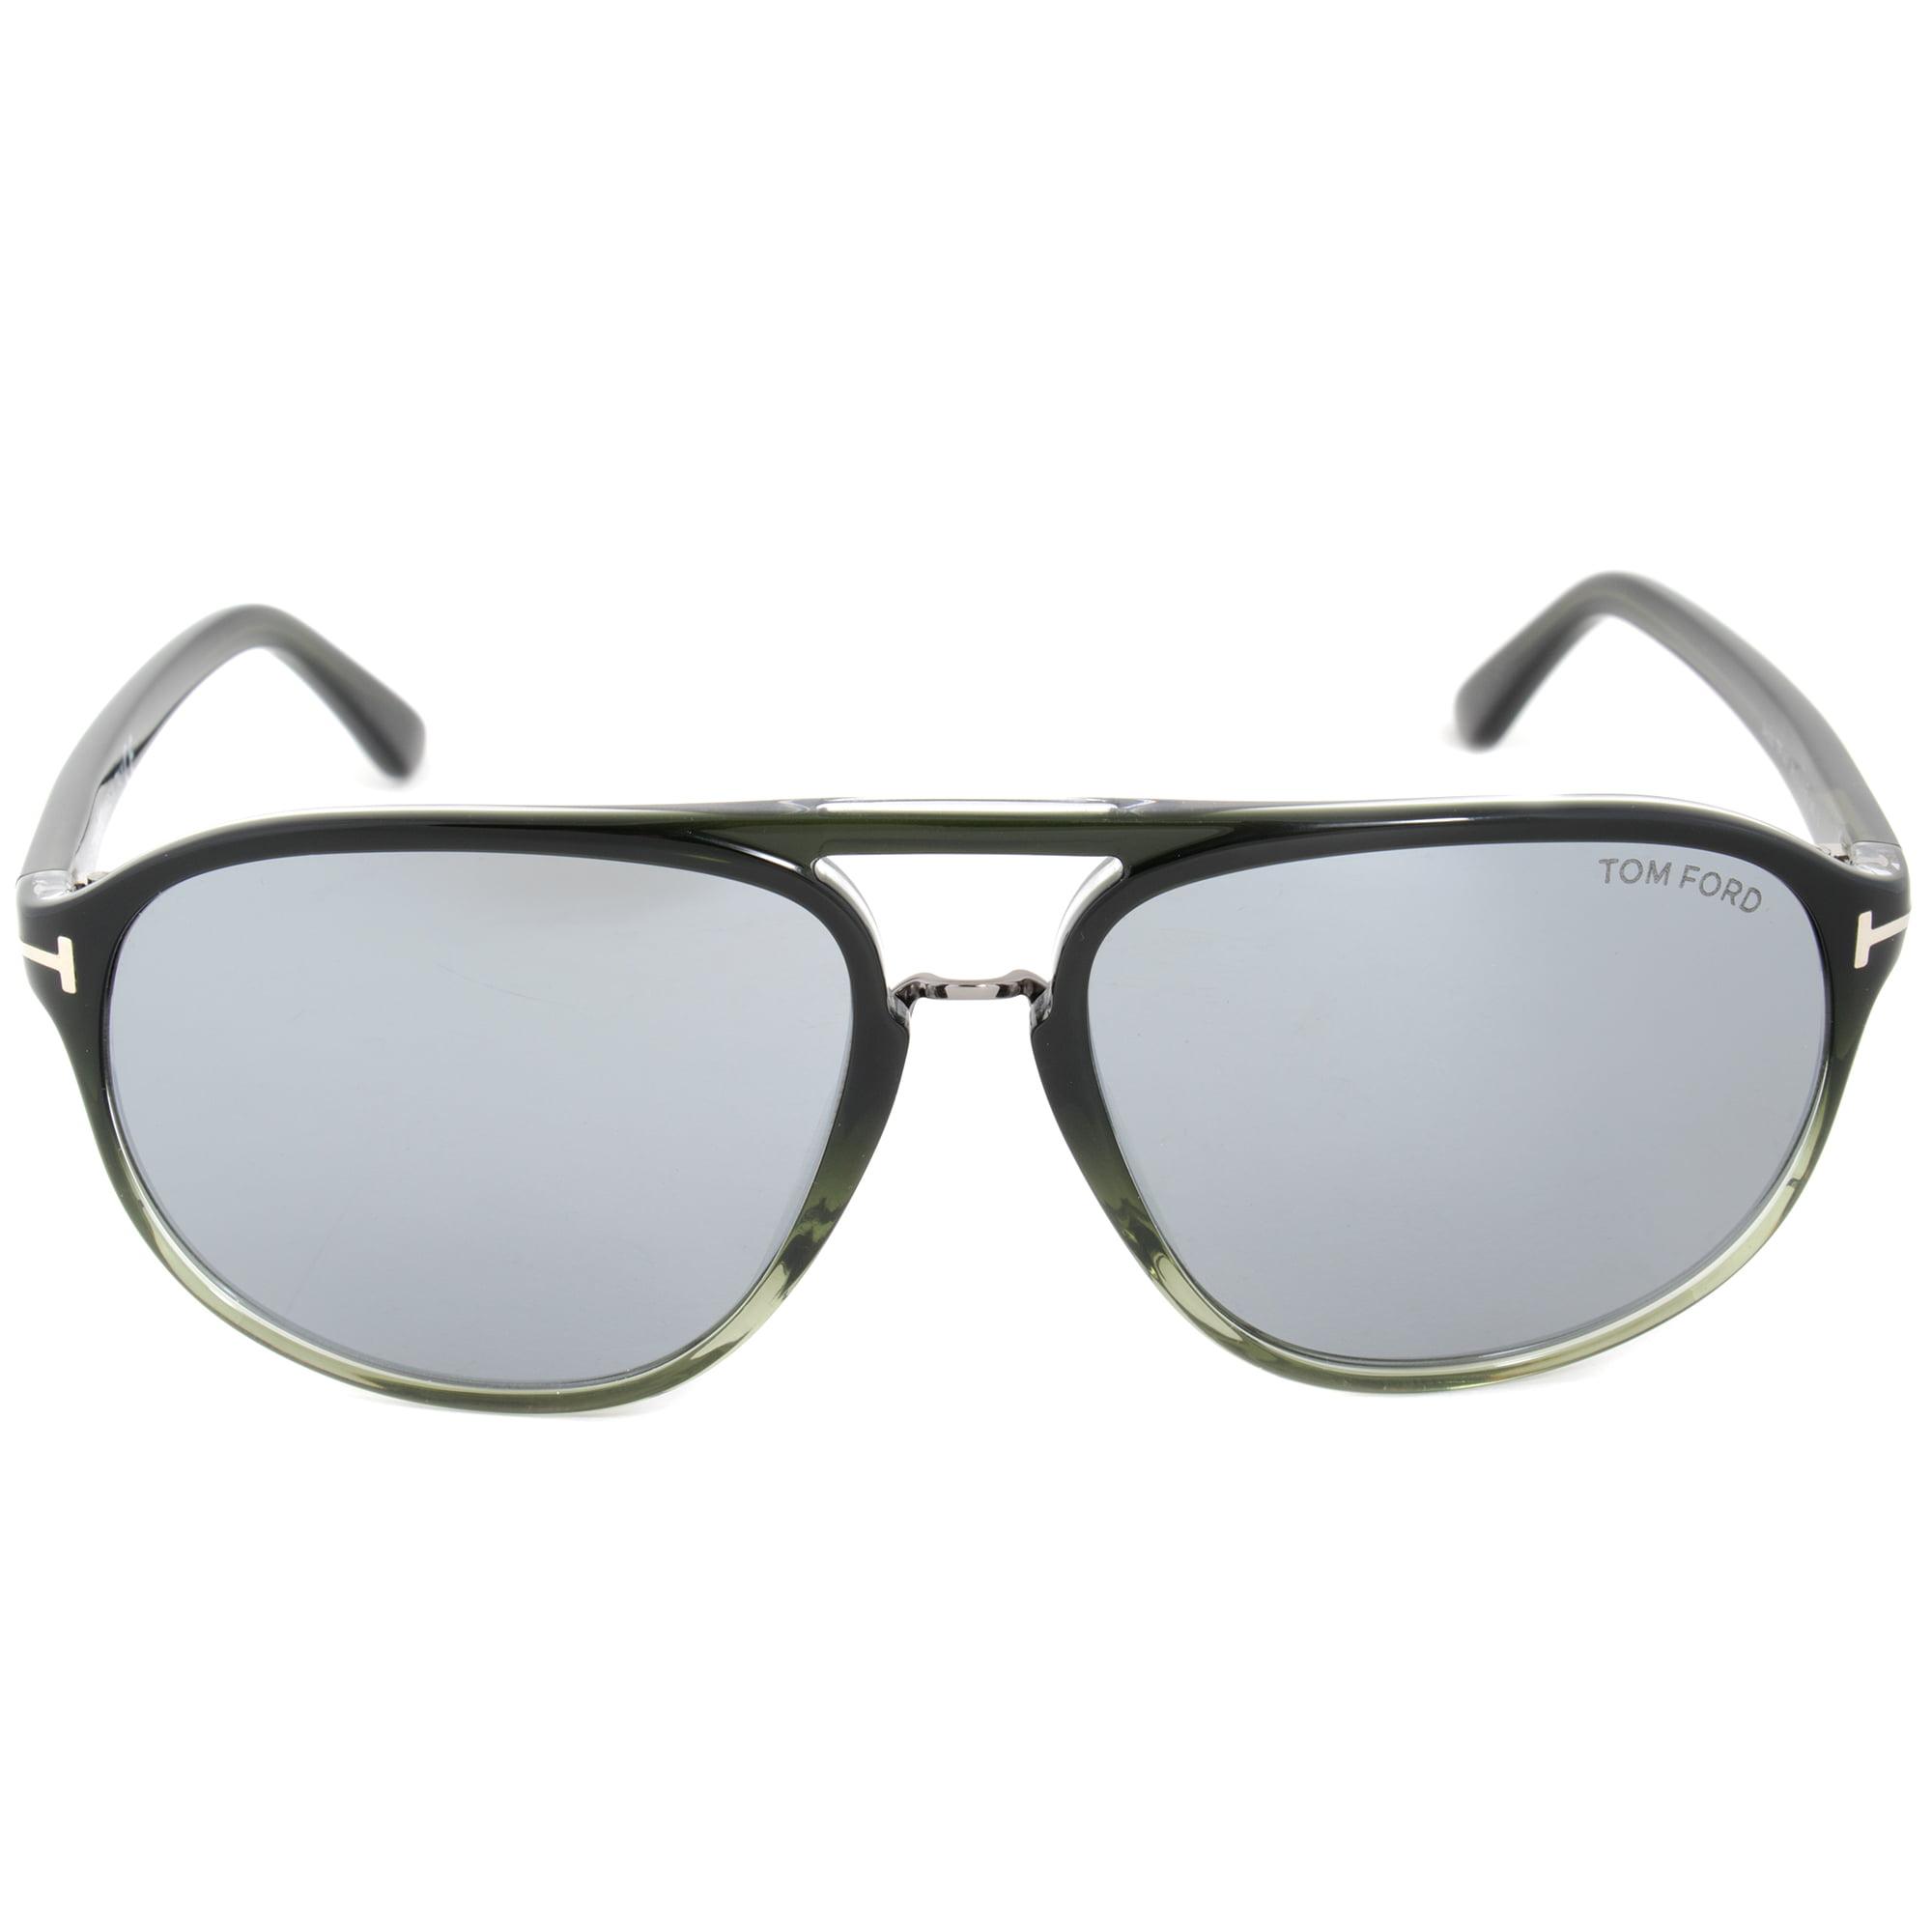 07081b9e07 Tom ford tom ford jacob sunglasses olive green frame blue mirror lens jpg  2000x2000 Olive mirrored